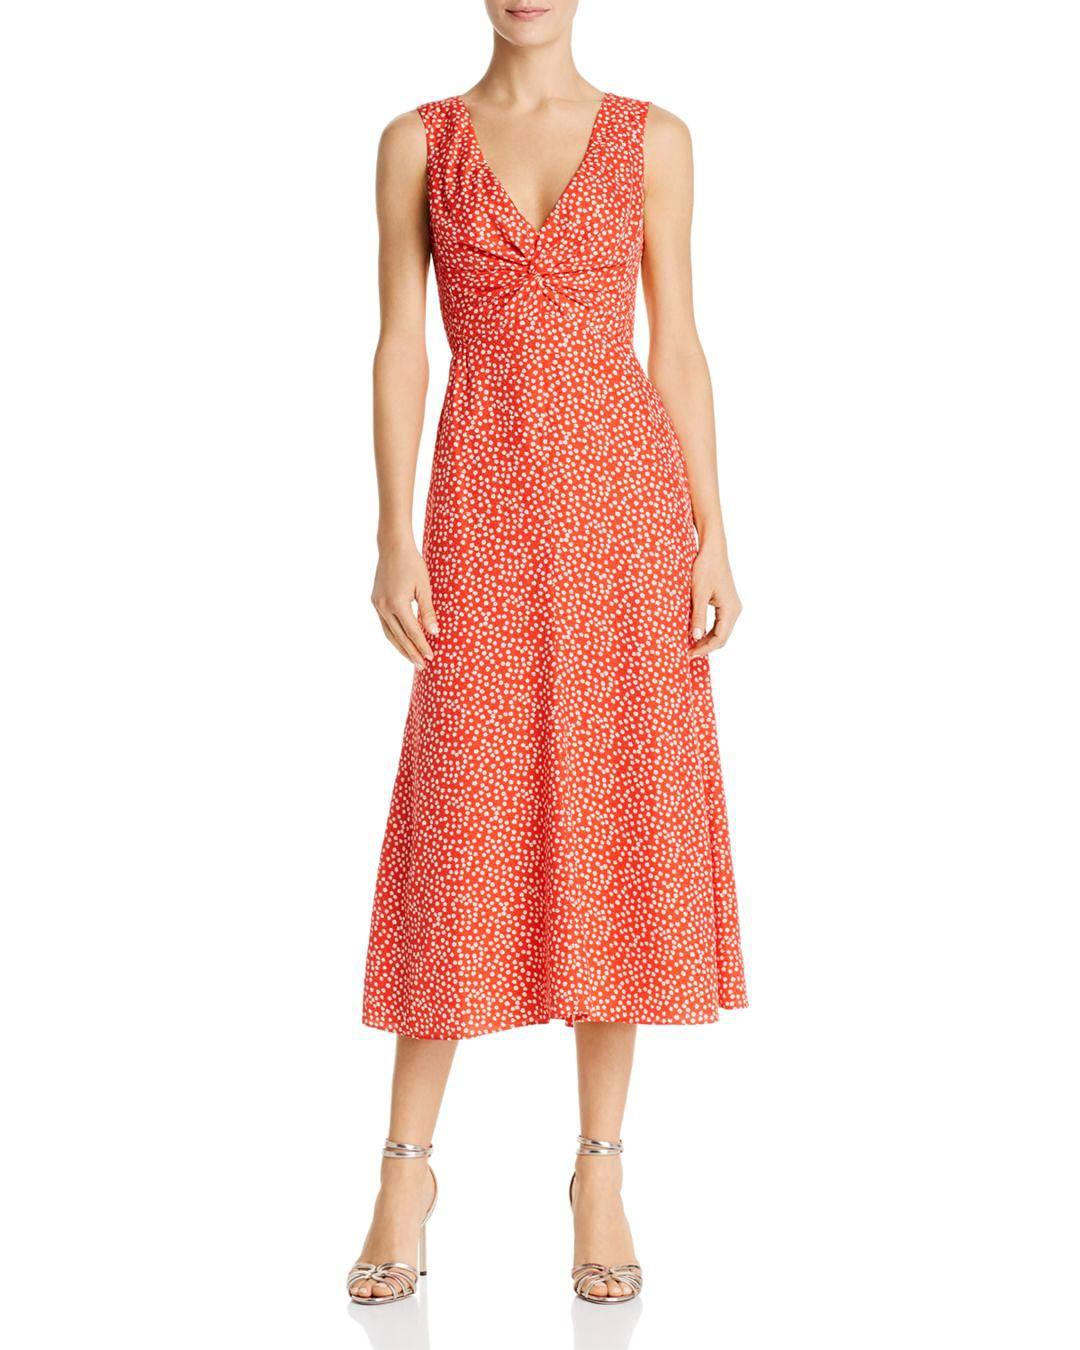 coral v-neck printed mob dress